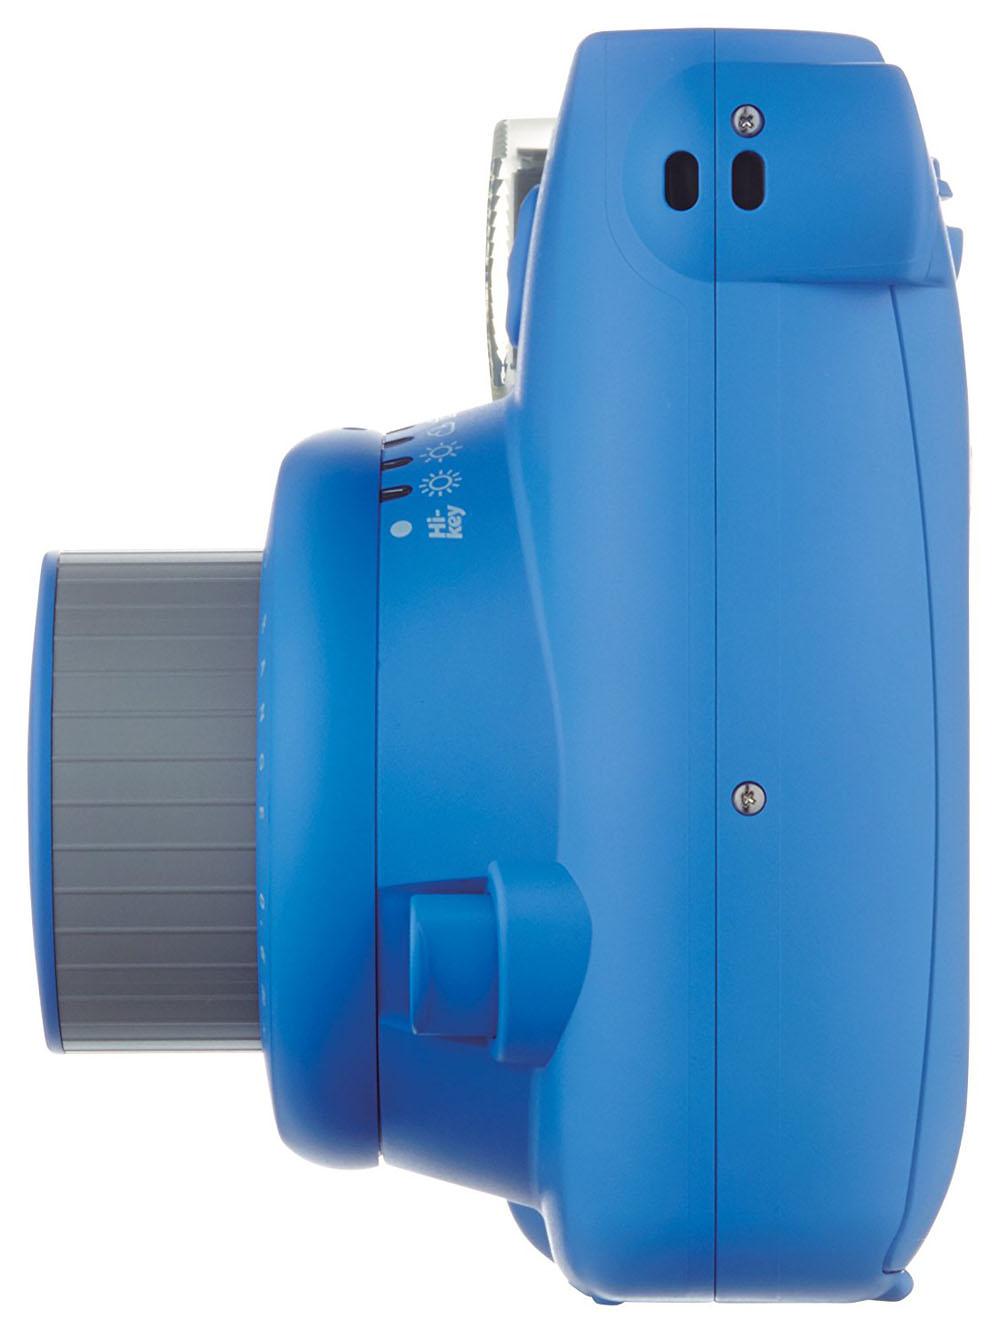 Genuine-Fuji-Fujifilm-Instax-Mini-9-Instant-Printing-Camera-Compact-Regular-Film-Snapshot-Camera-Shooting-Photos (3)